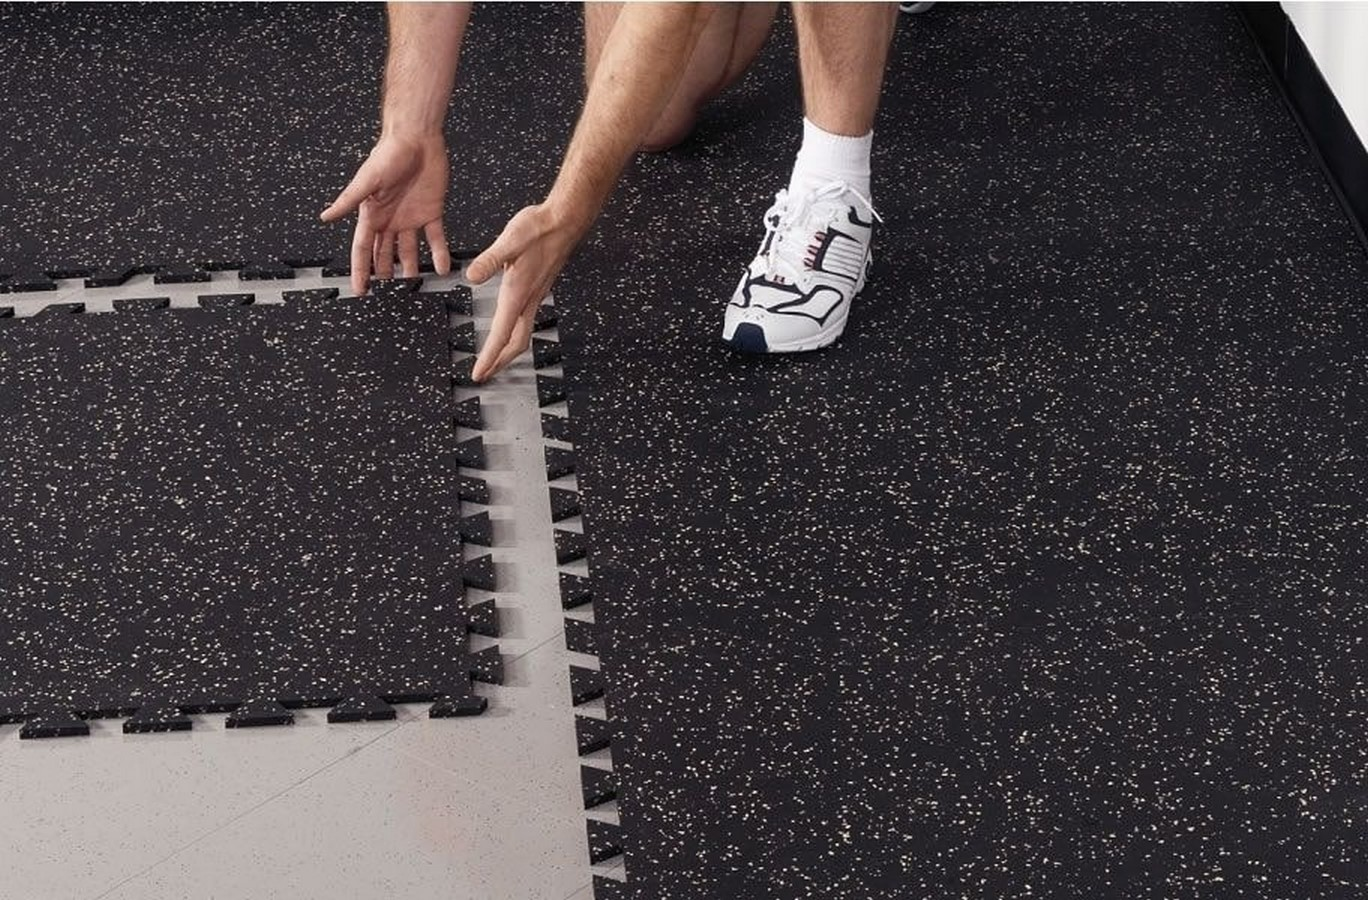 20 flooring ideas for home renovation - Sheet6